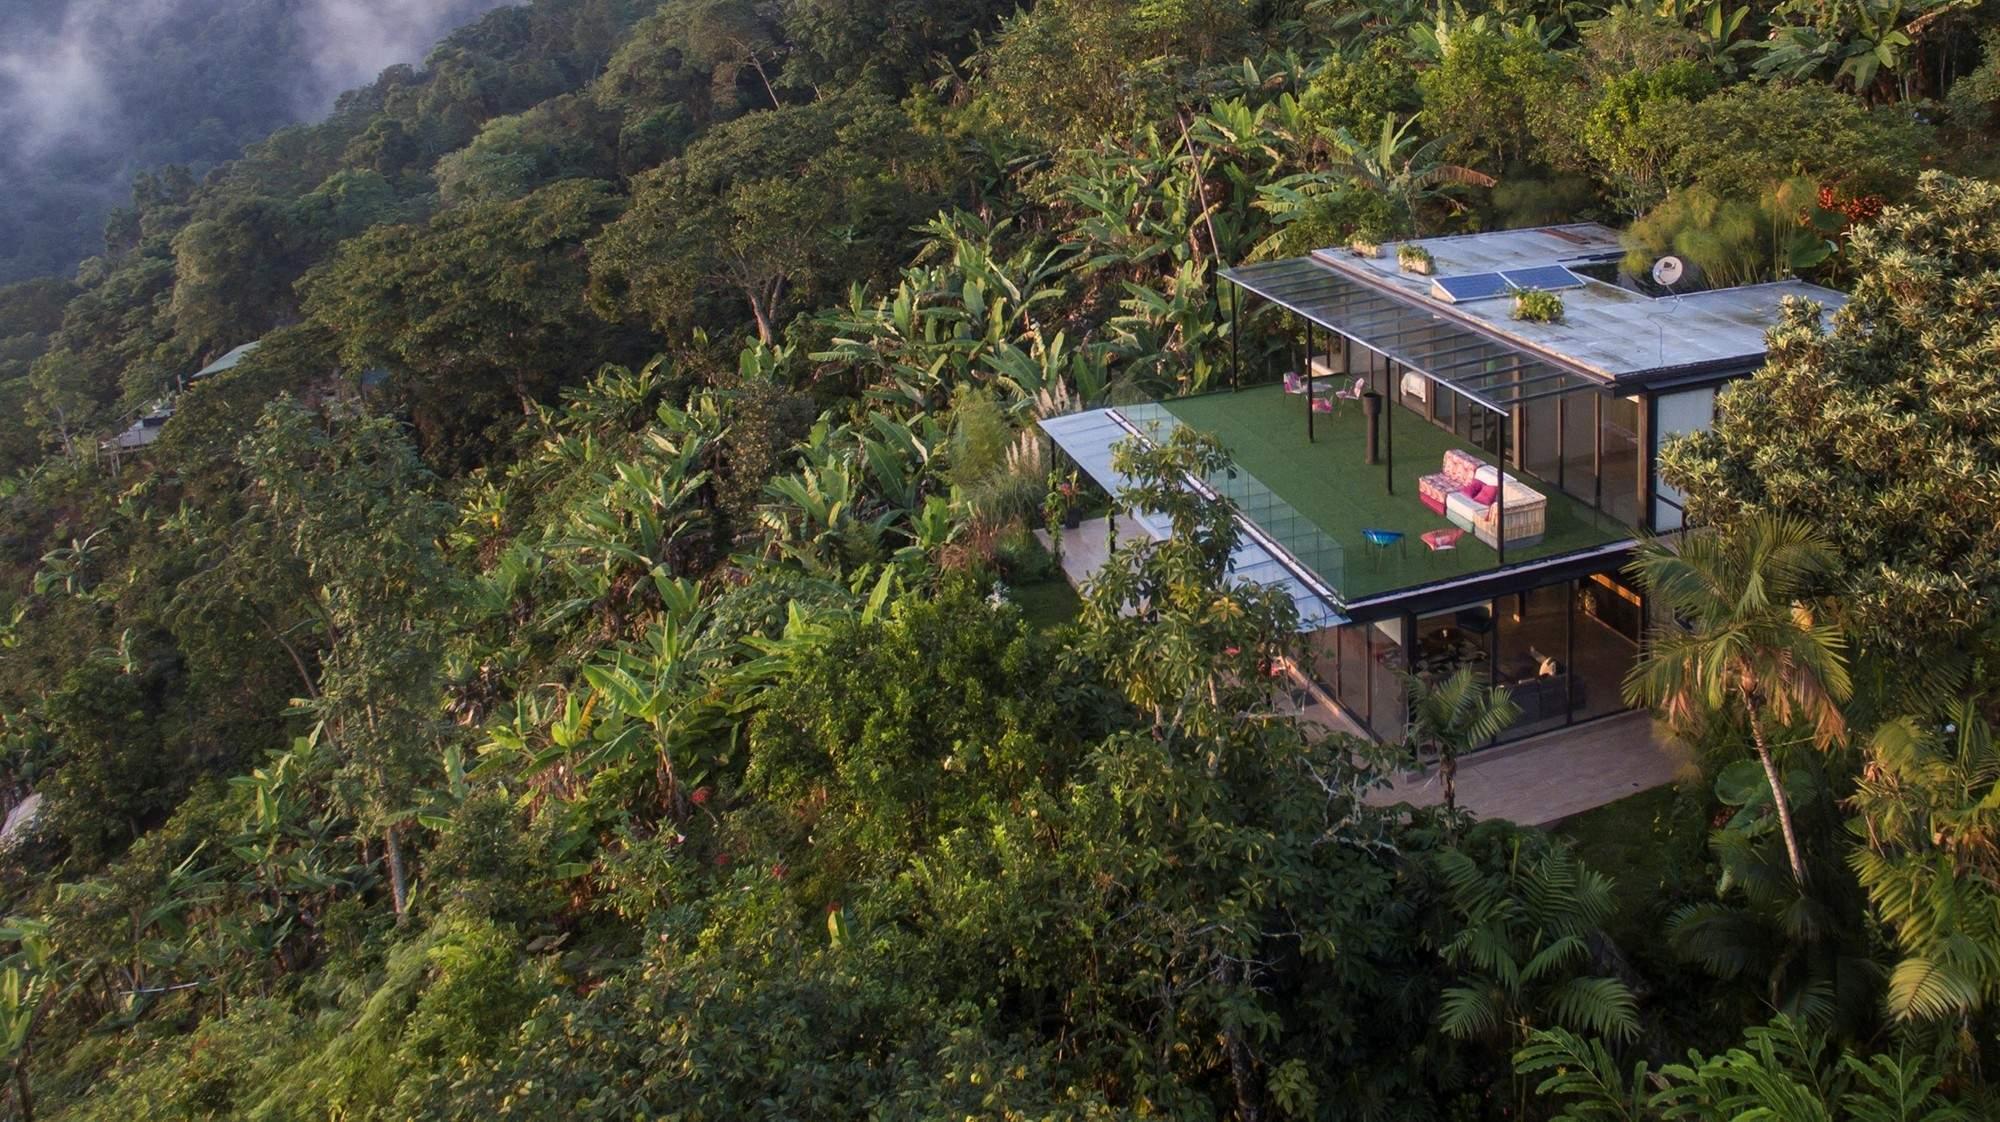 Вилла со стеклянными стенами в горах Колумбии